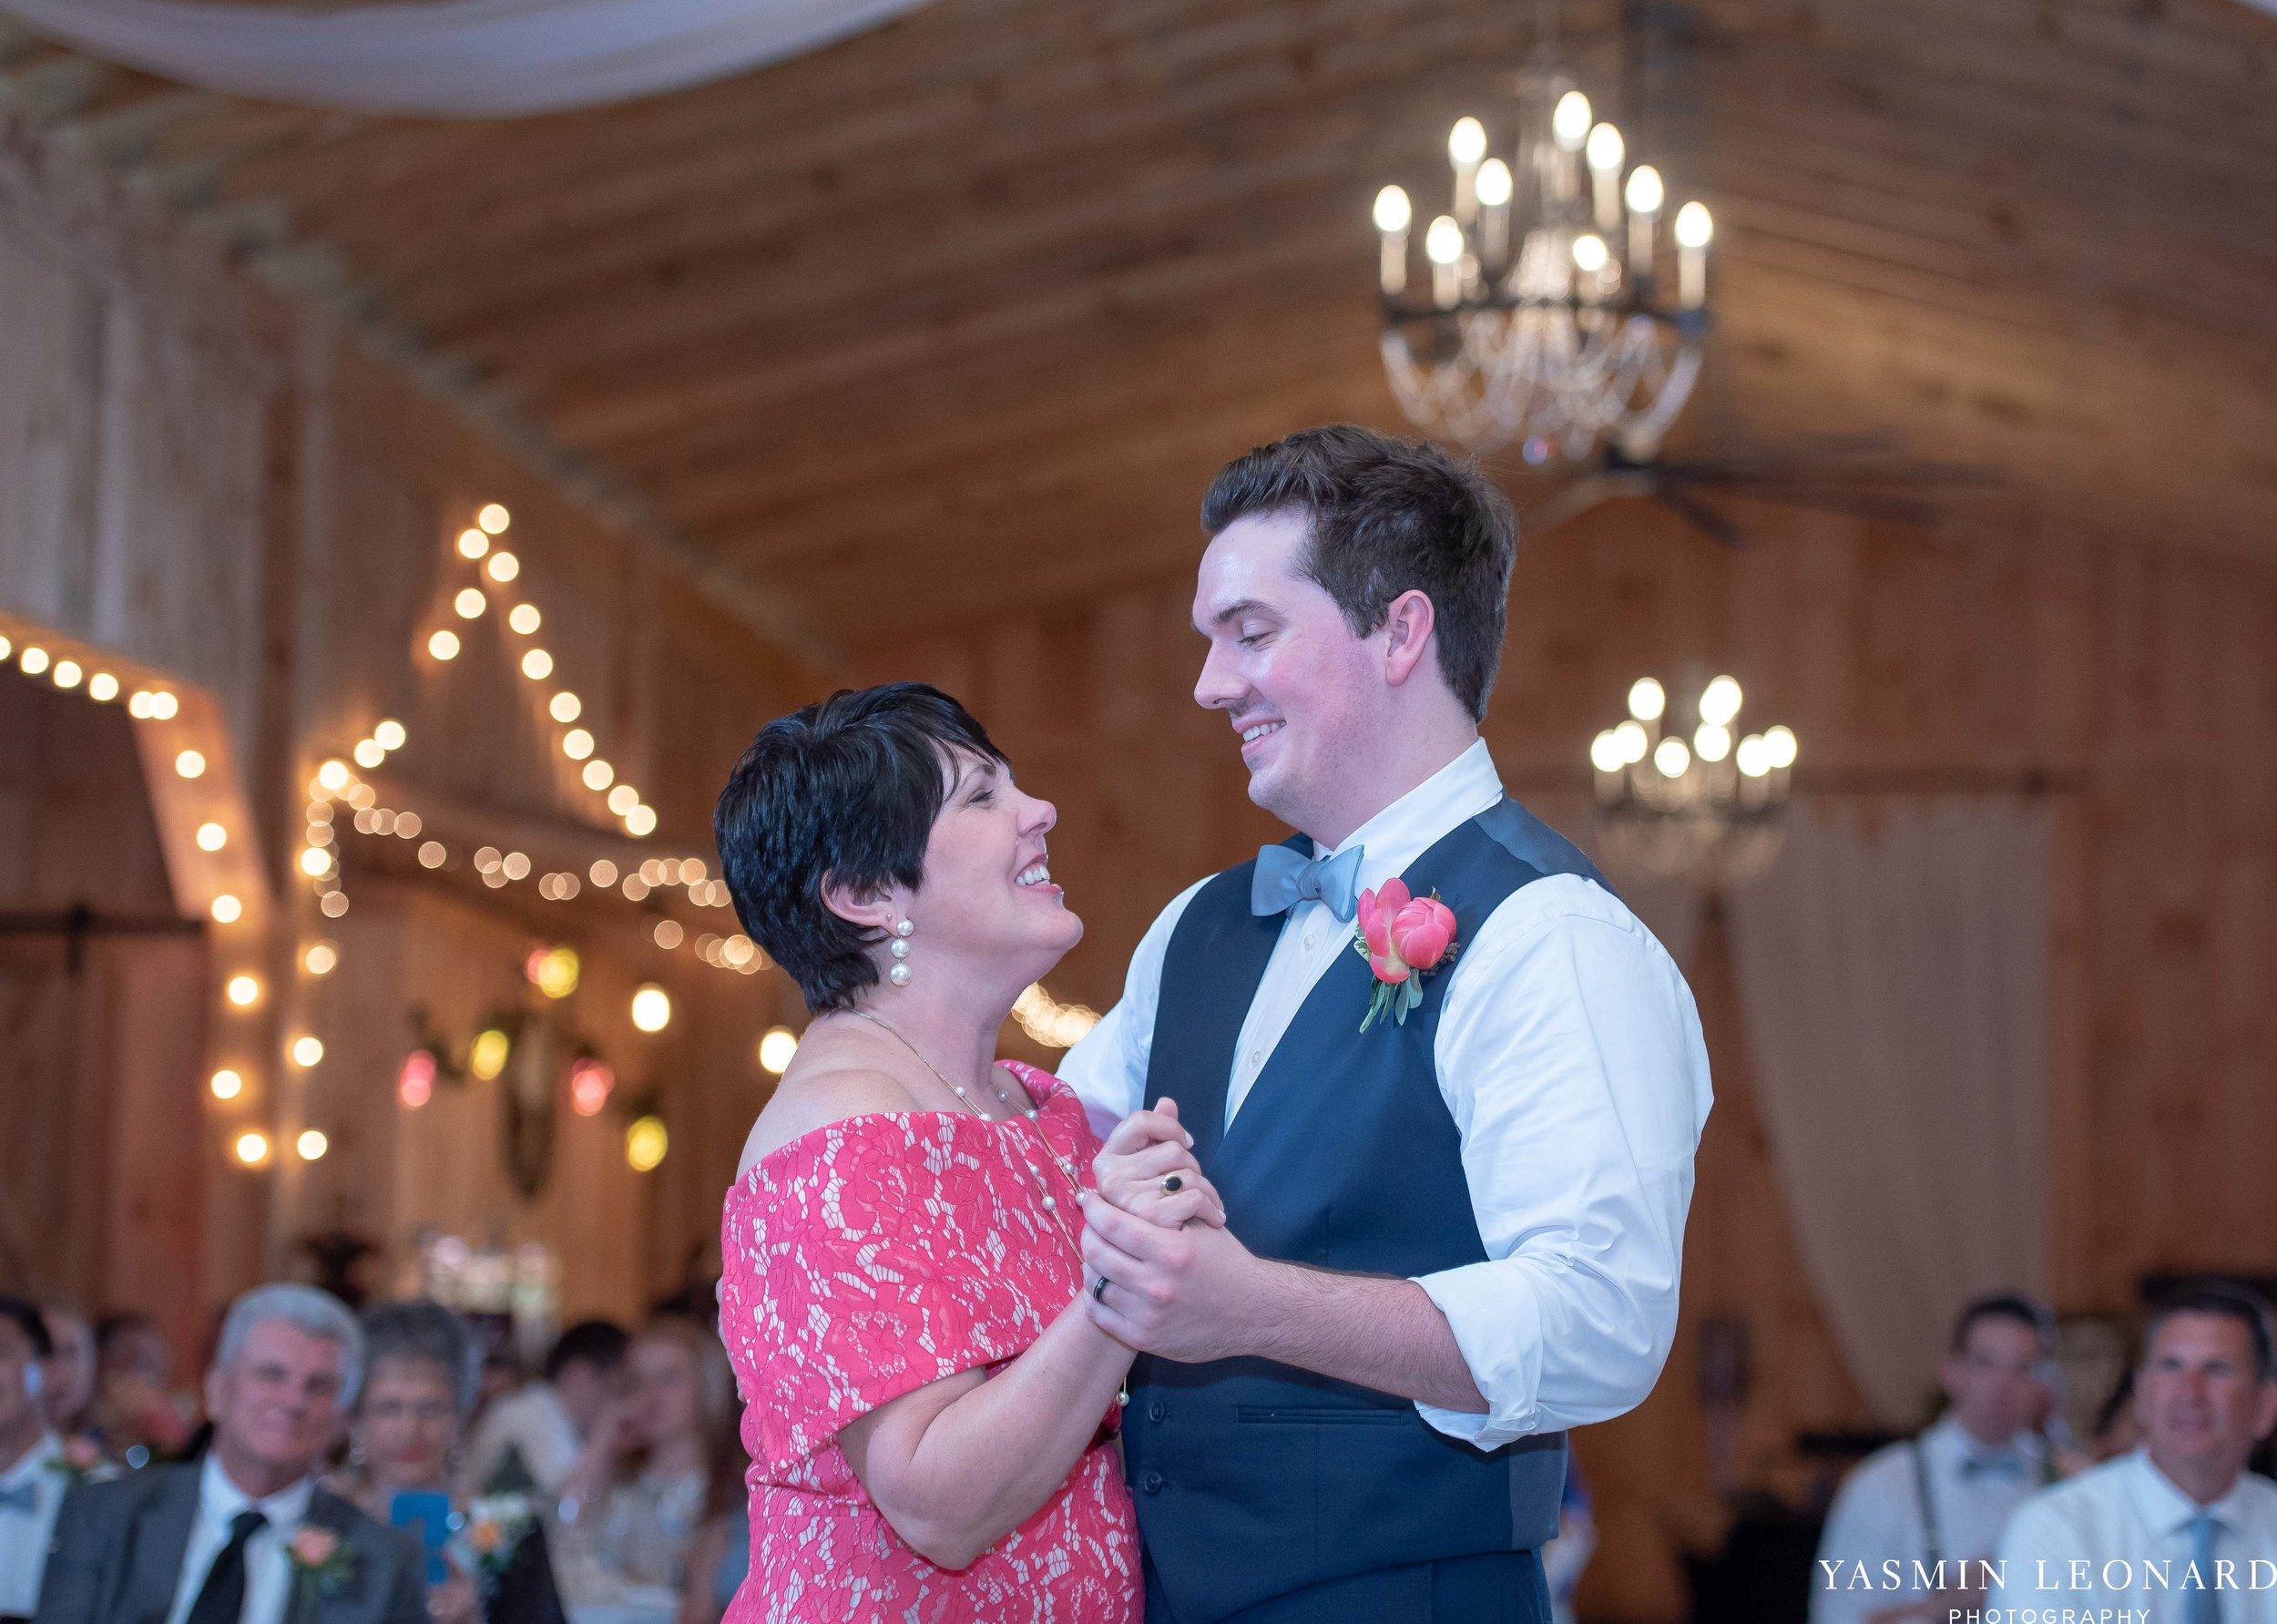 Old Homeplace Vineyard - NC Weddings - Outdoor Summer Weddings - Peony Boutique - Vineyard Wedding - NC Photographer - Yasmin Leonard Photography-72.jpg